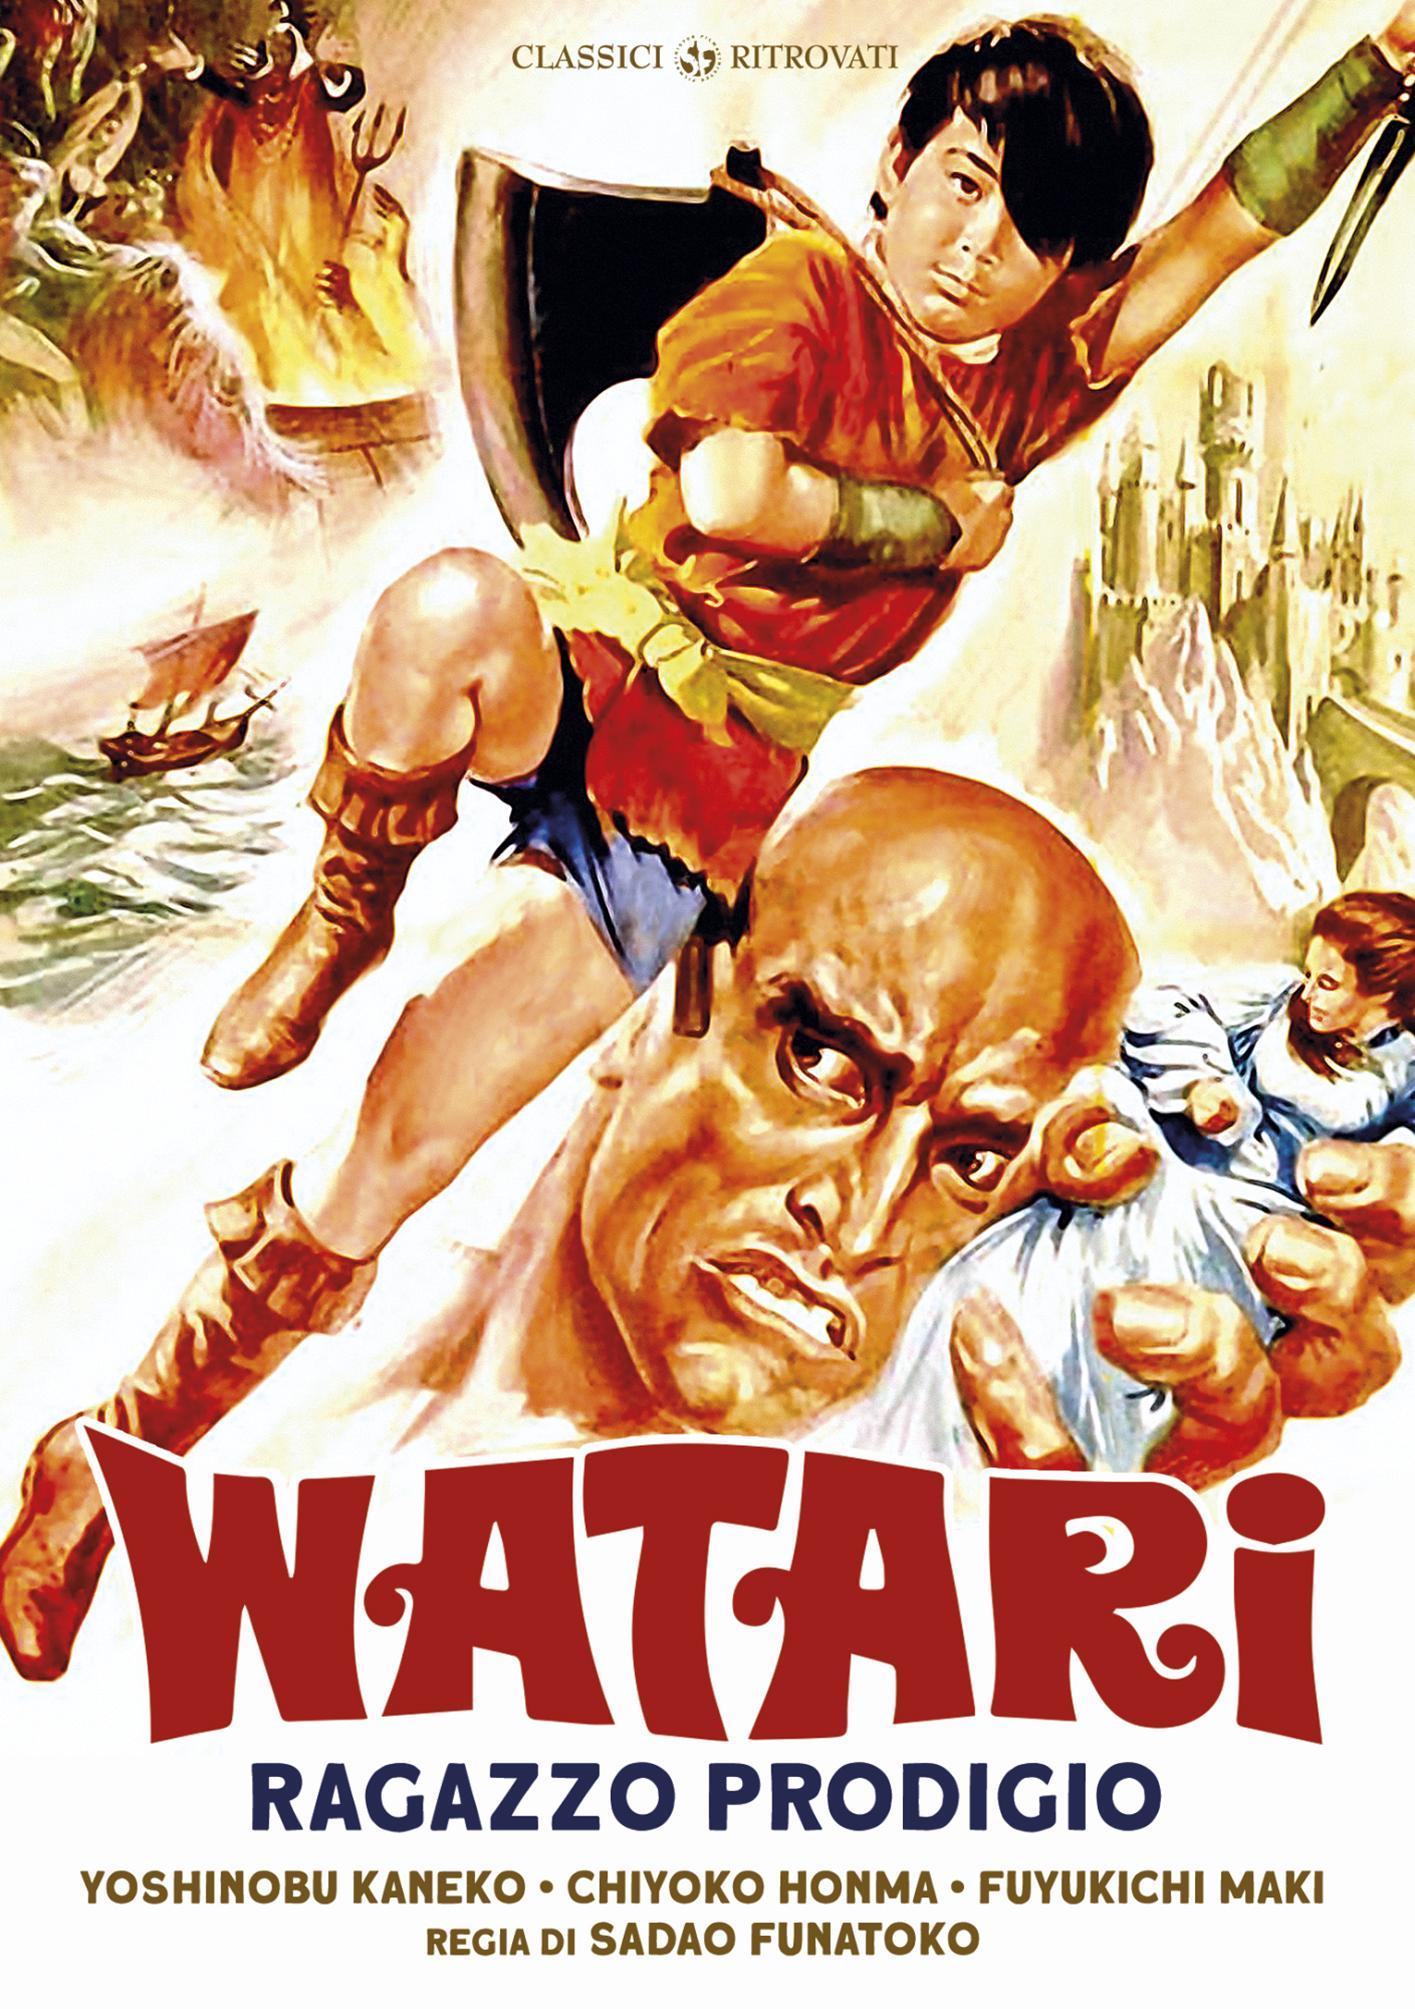 WATARI RAGAZZO PRODIGIO (DVD)